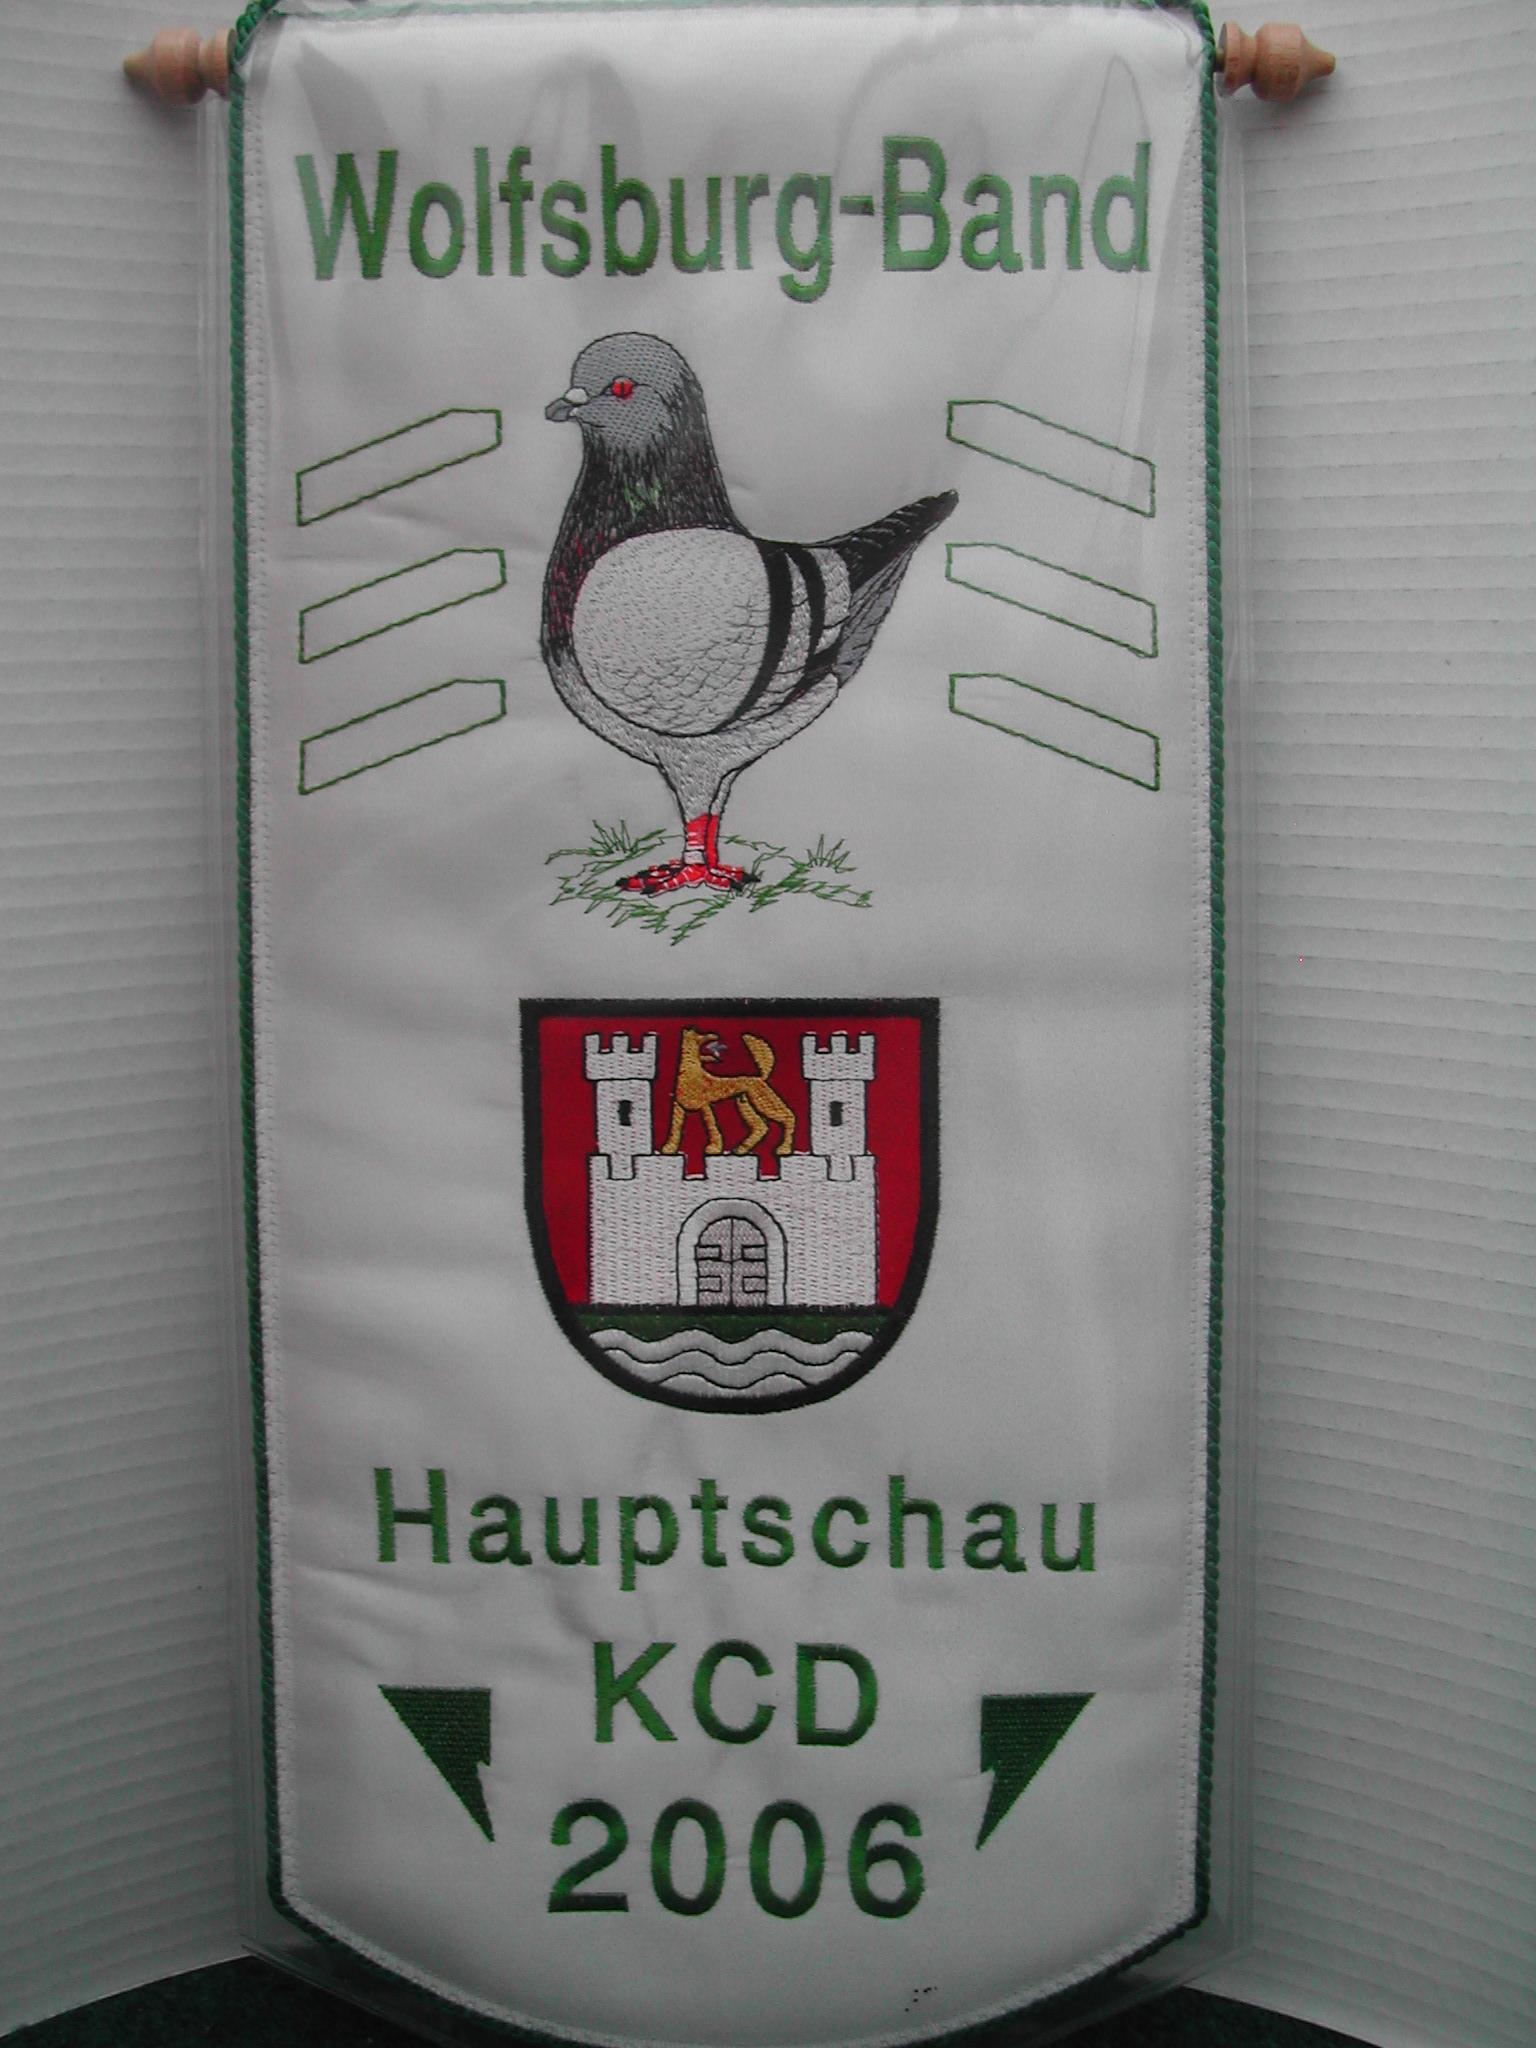 HSS KCD Wolfsburg 2006